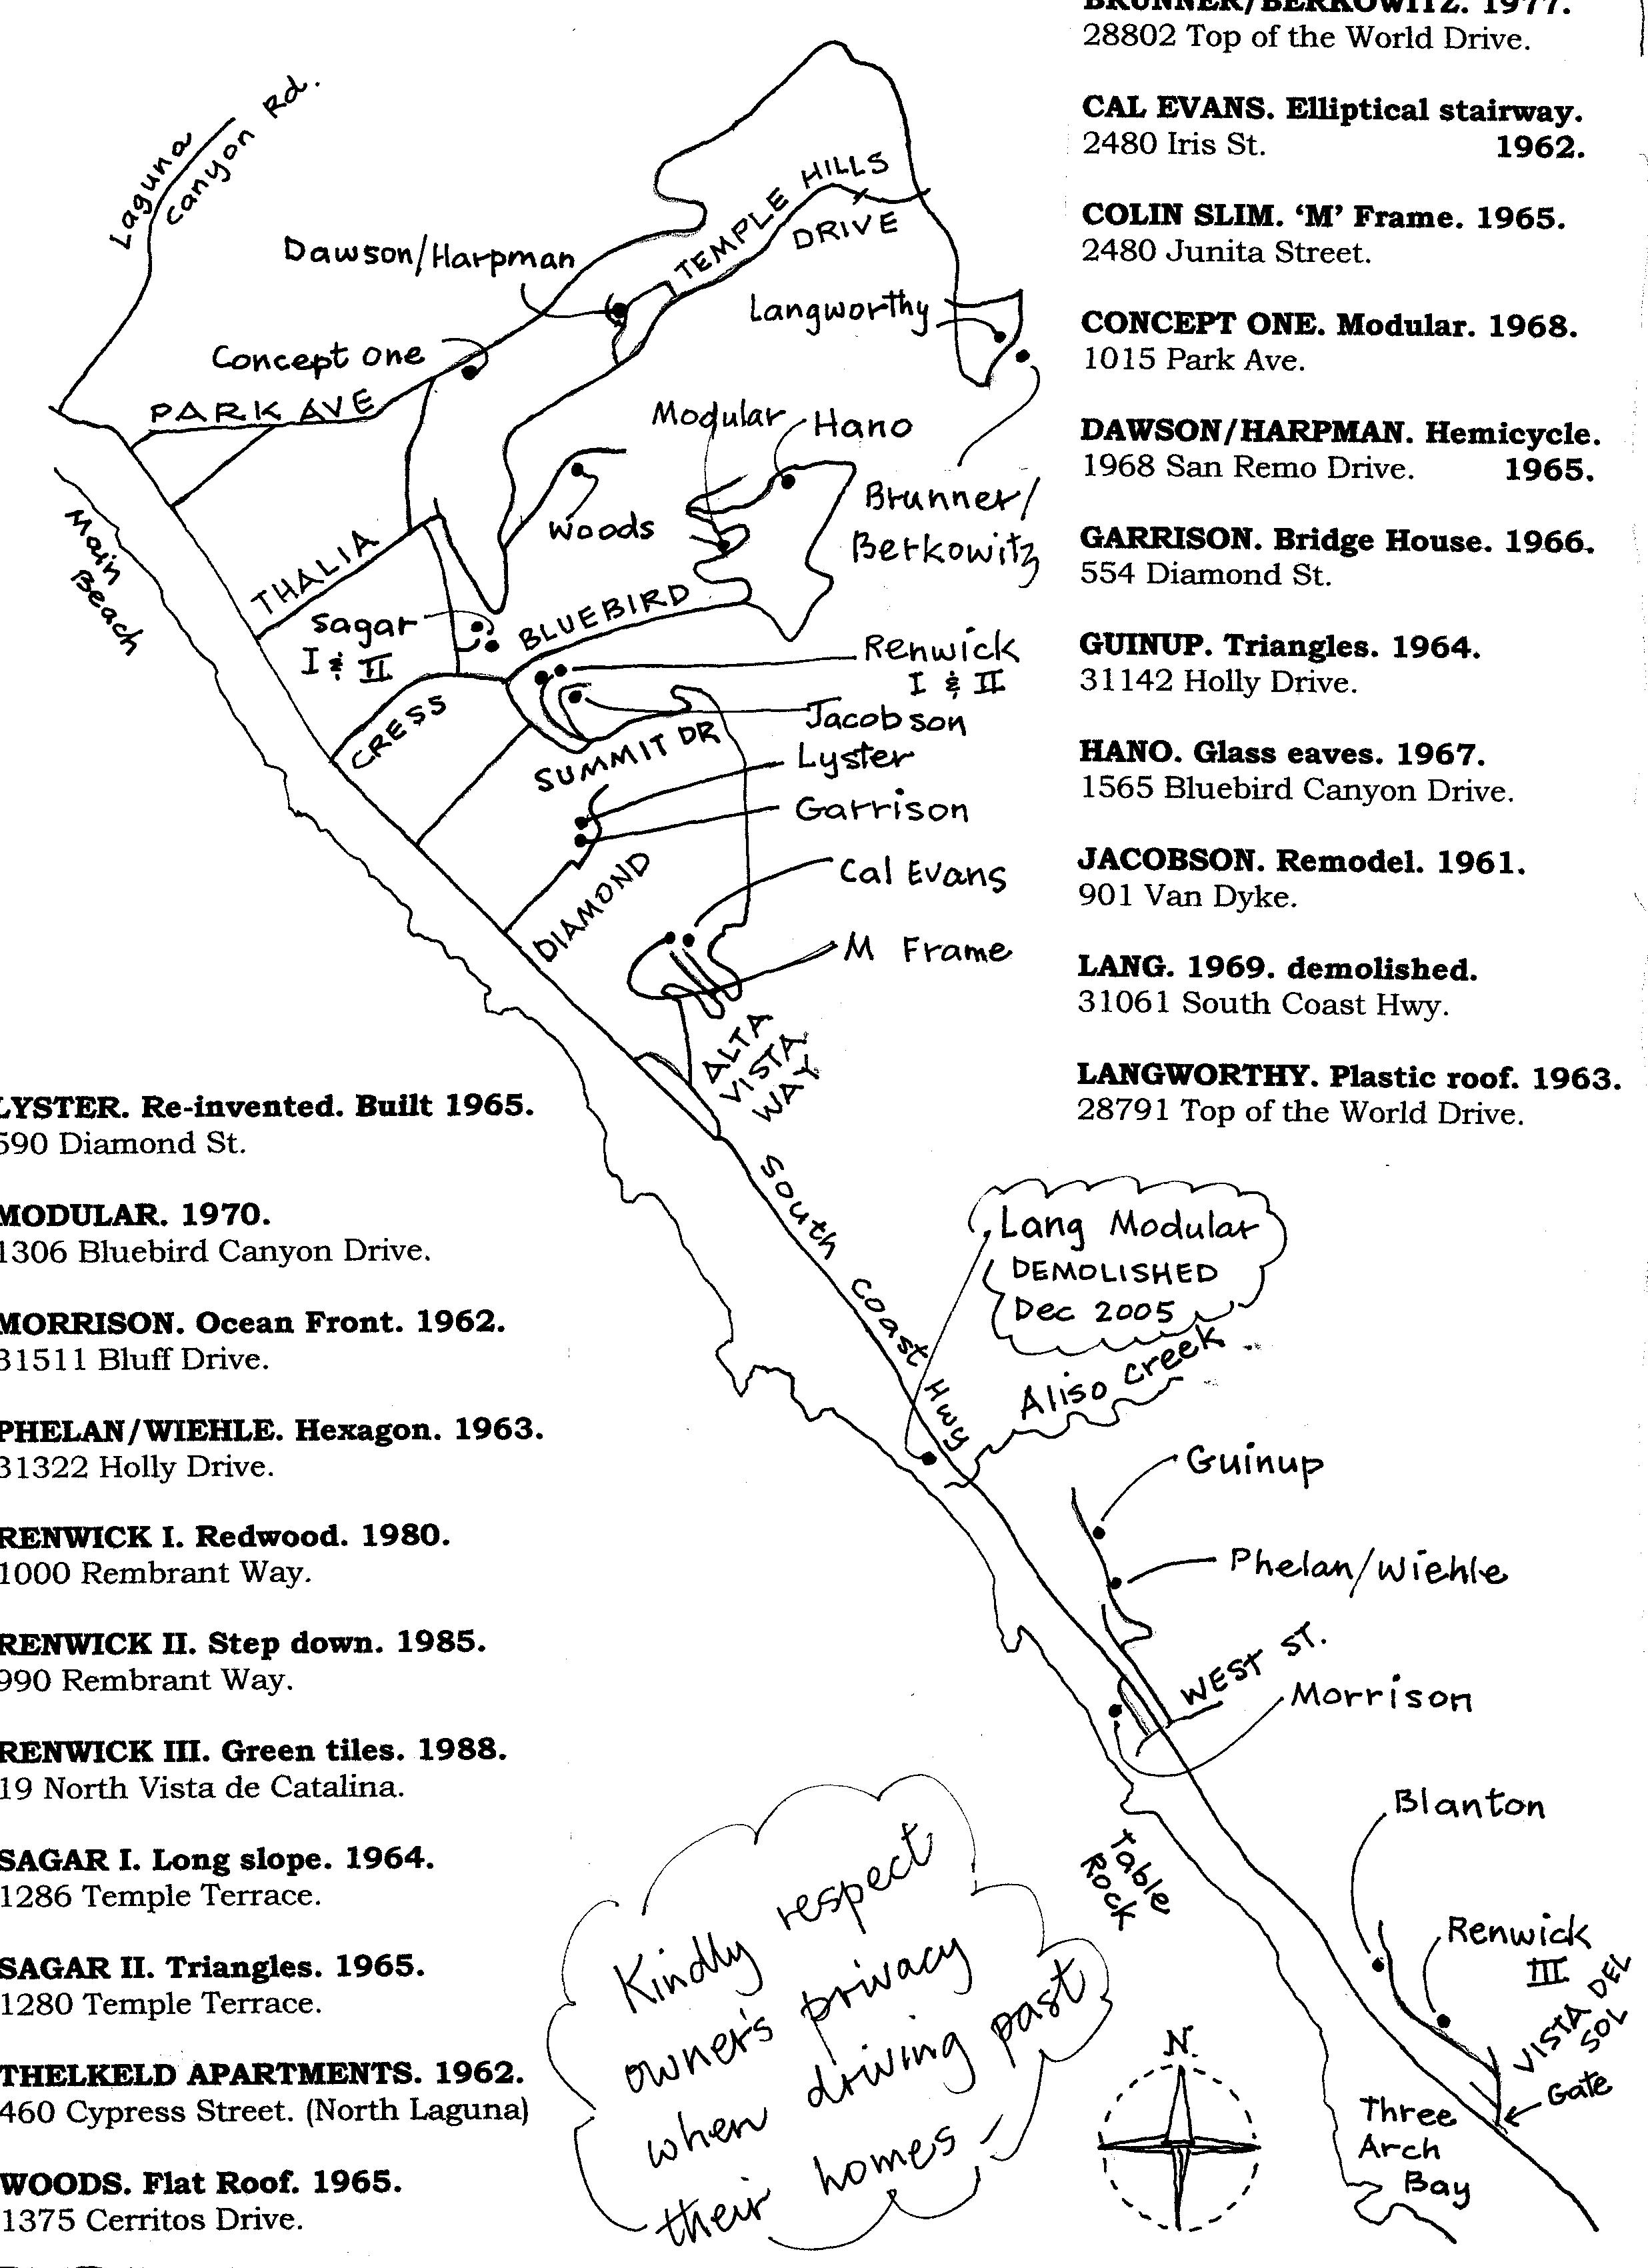 langworthy map 3-3